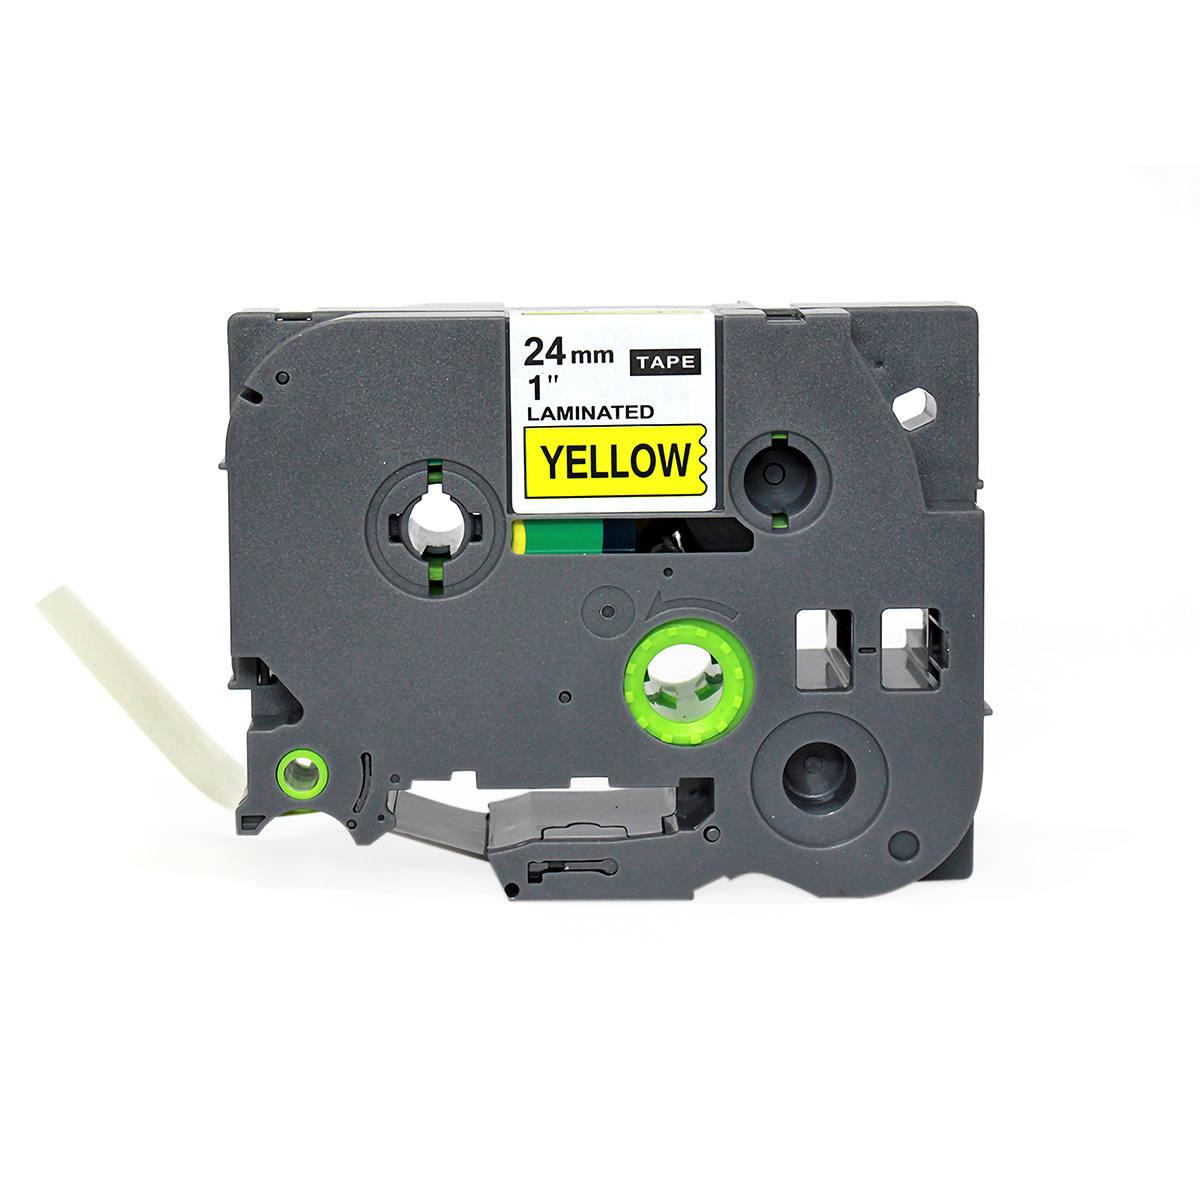 Fita Compatível para Rotulador 24mm x 8m Amarelo/Preto Marca X-Full Referência TZc-651 TZe-651 TZ-651 para Brother